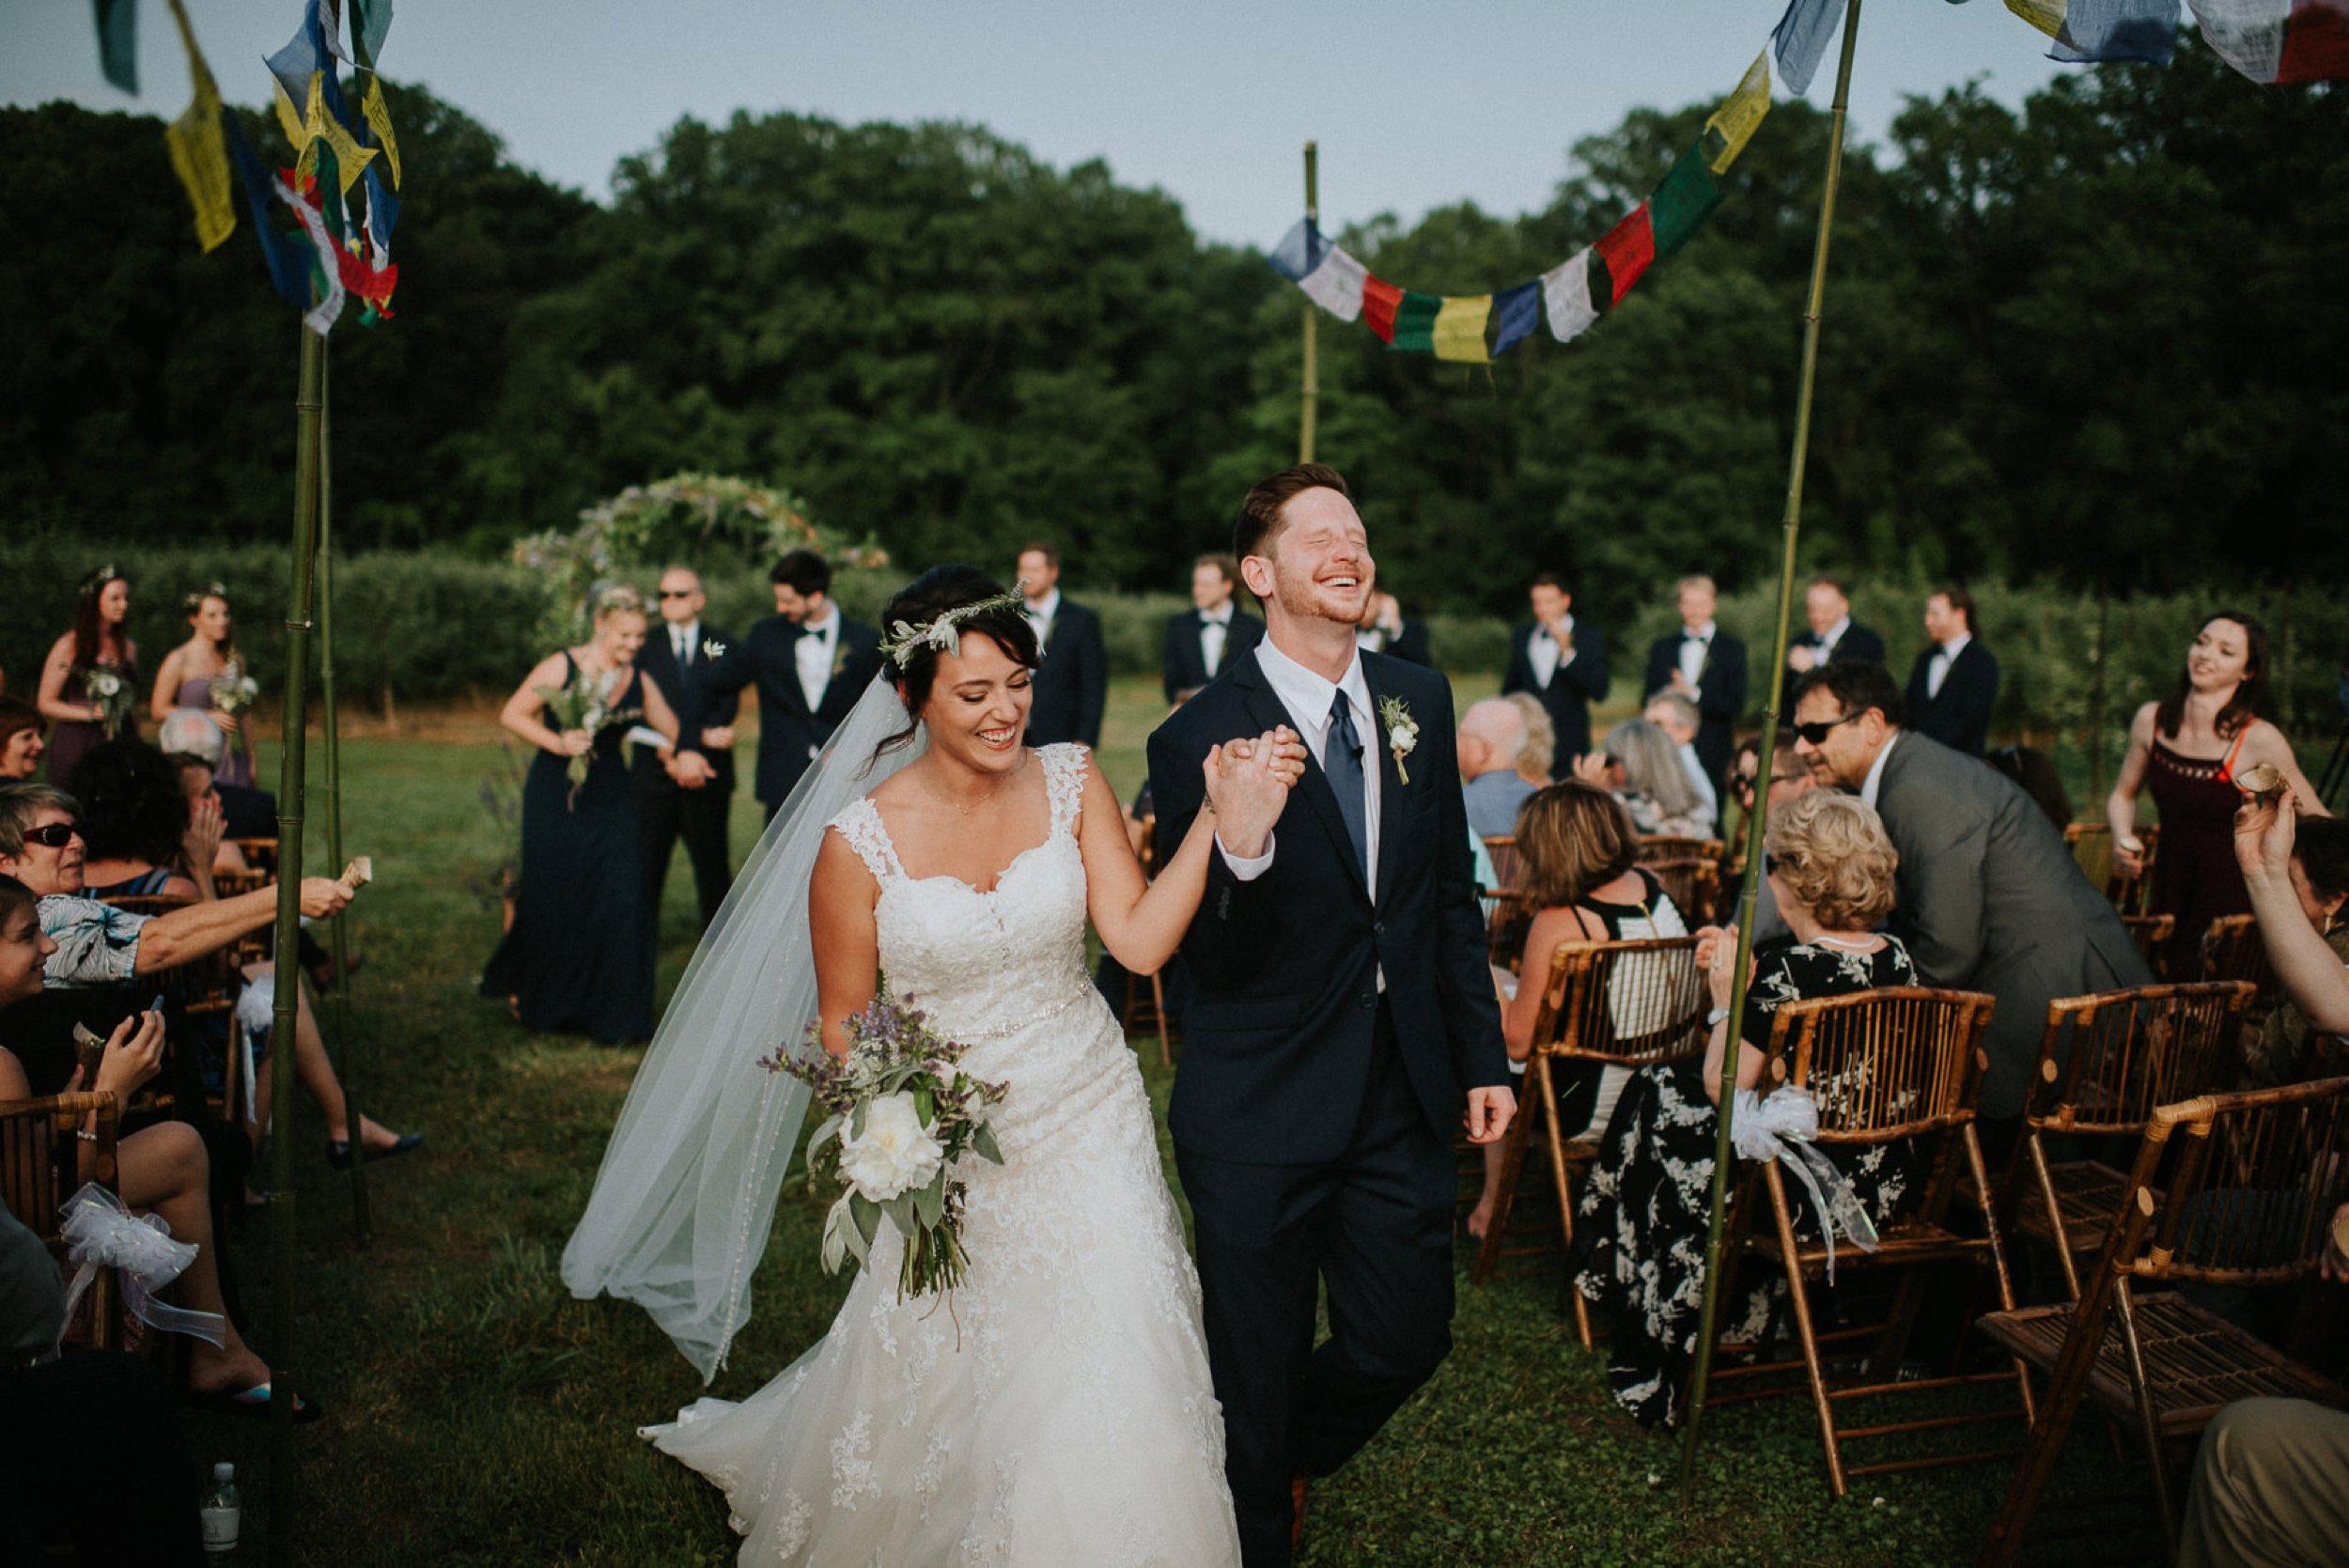 milburn_farms-wedding-43.jpg